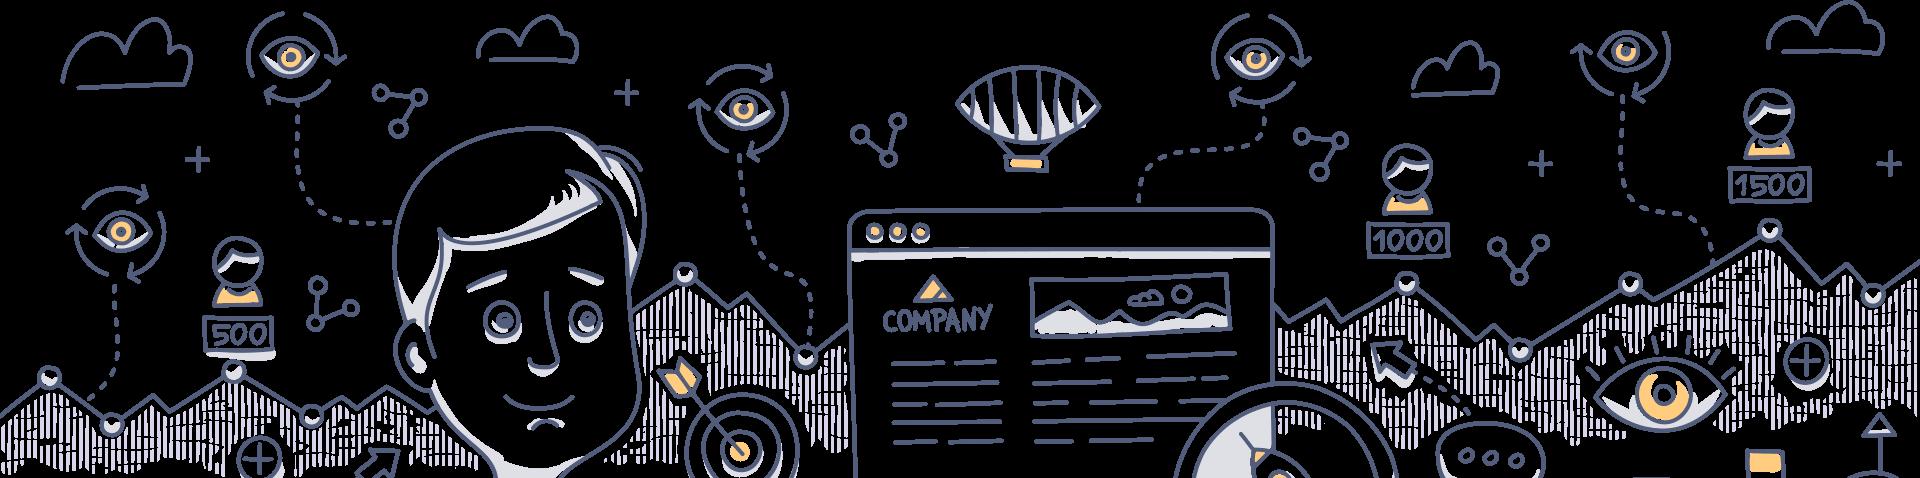 TechLiberate - Custom Application Development Services